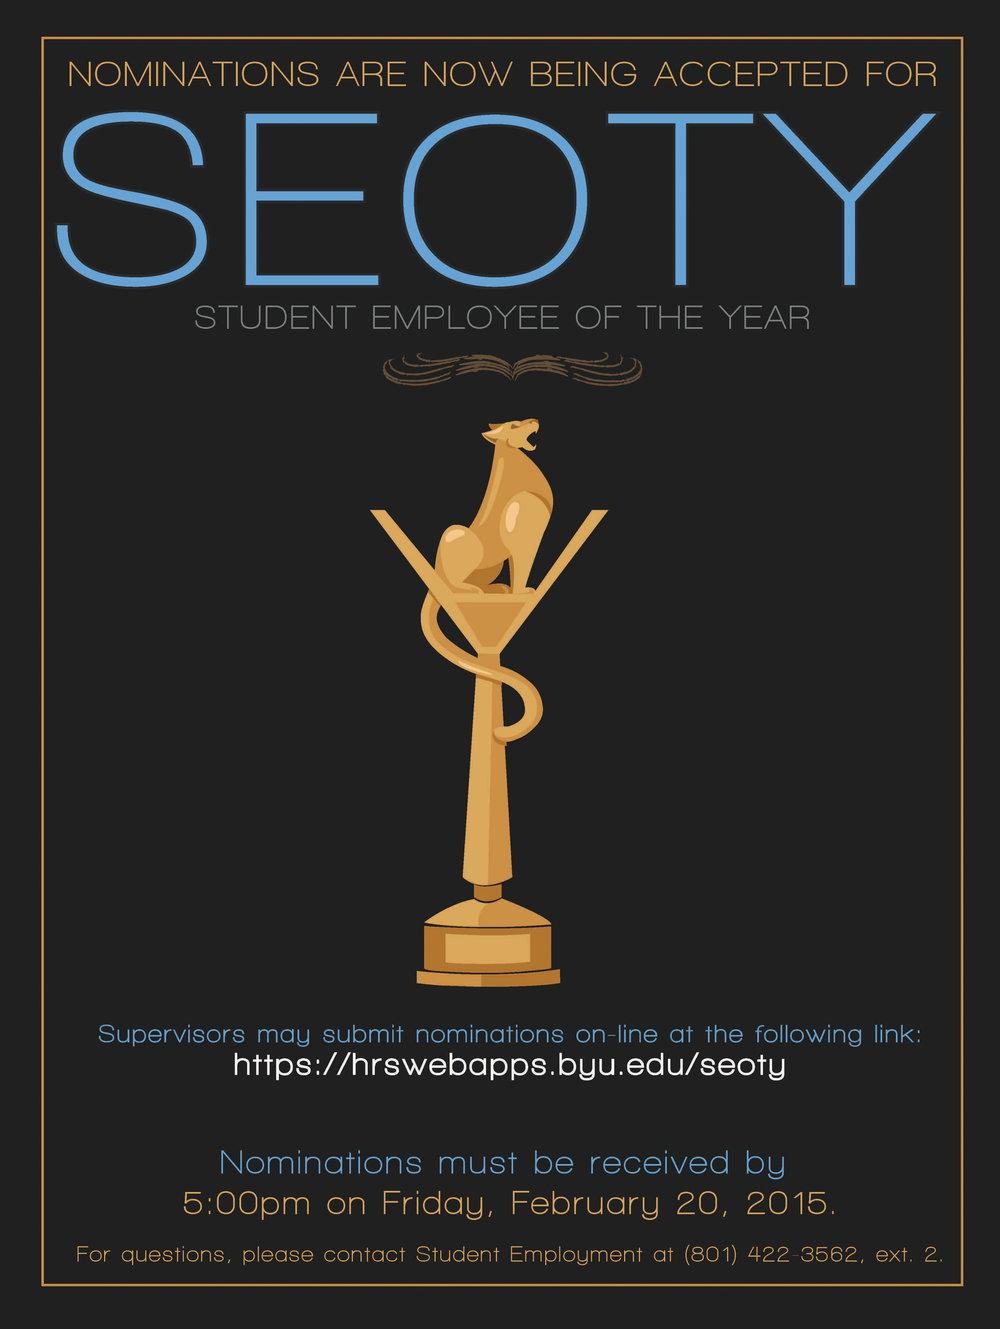 seoty-poster2.jpg